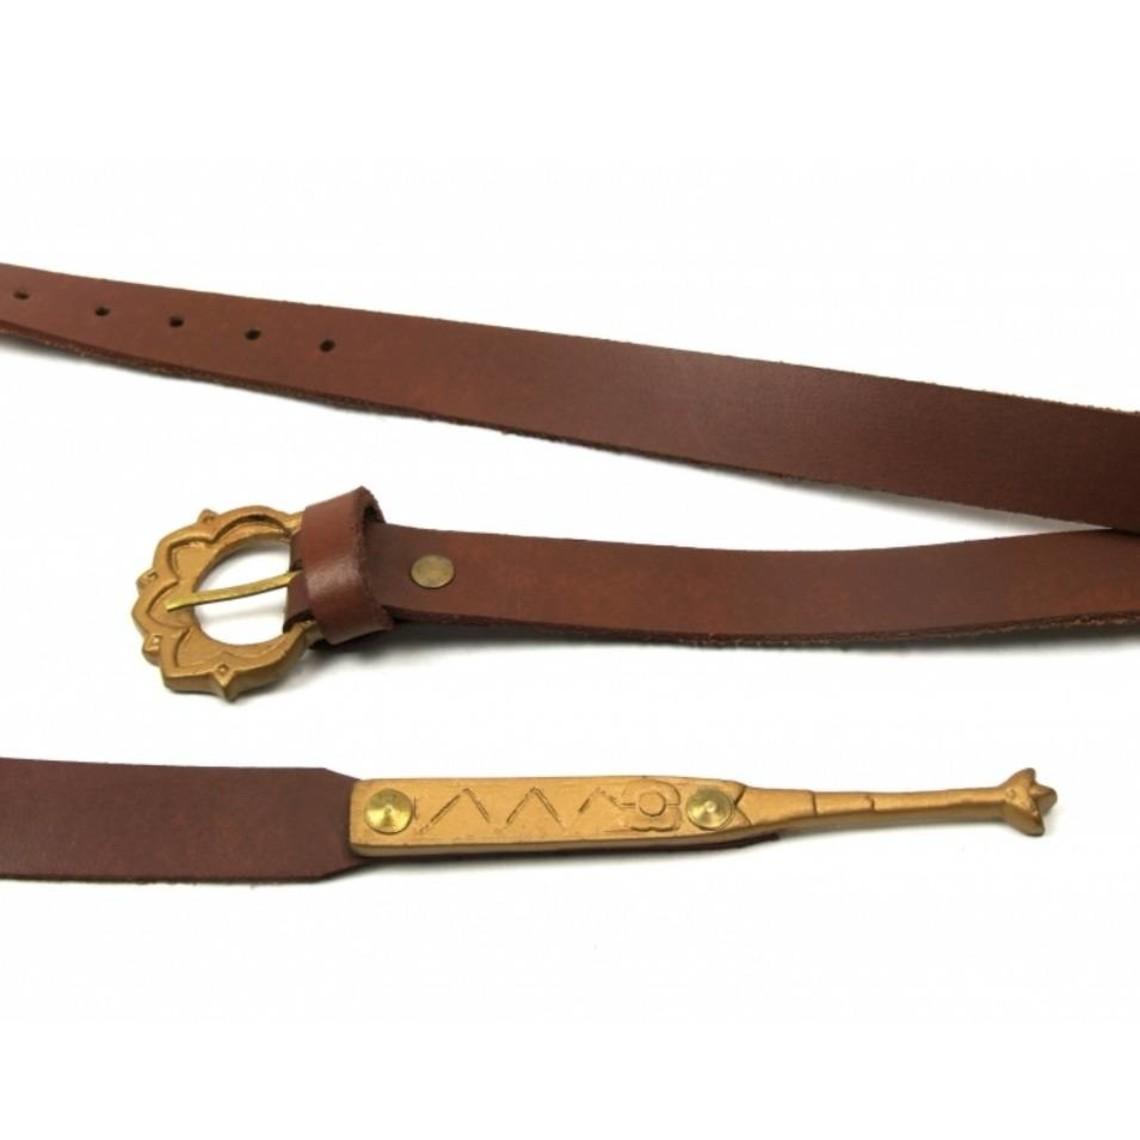 Leonardo Carbone Cintura medievale Iseburgis, marrone